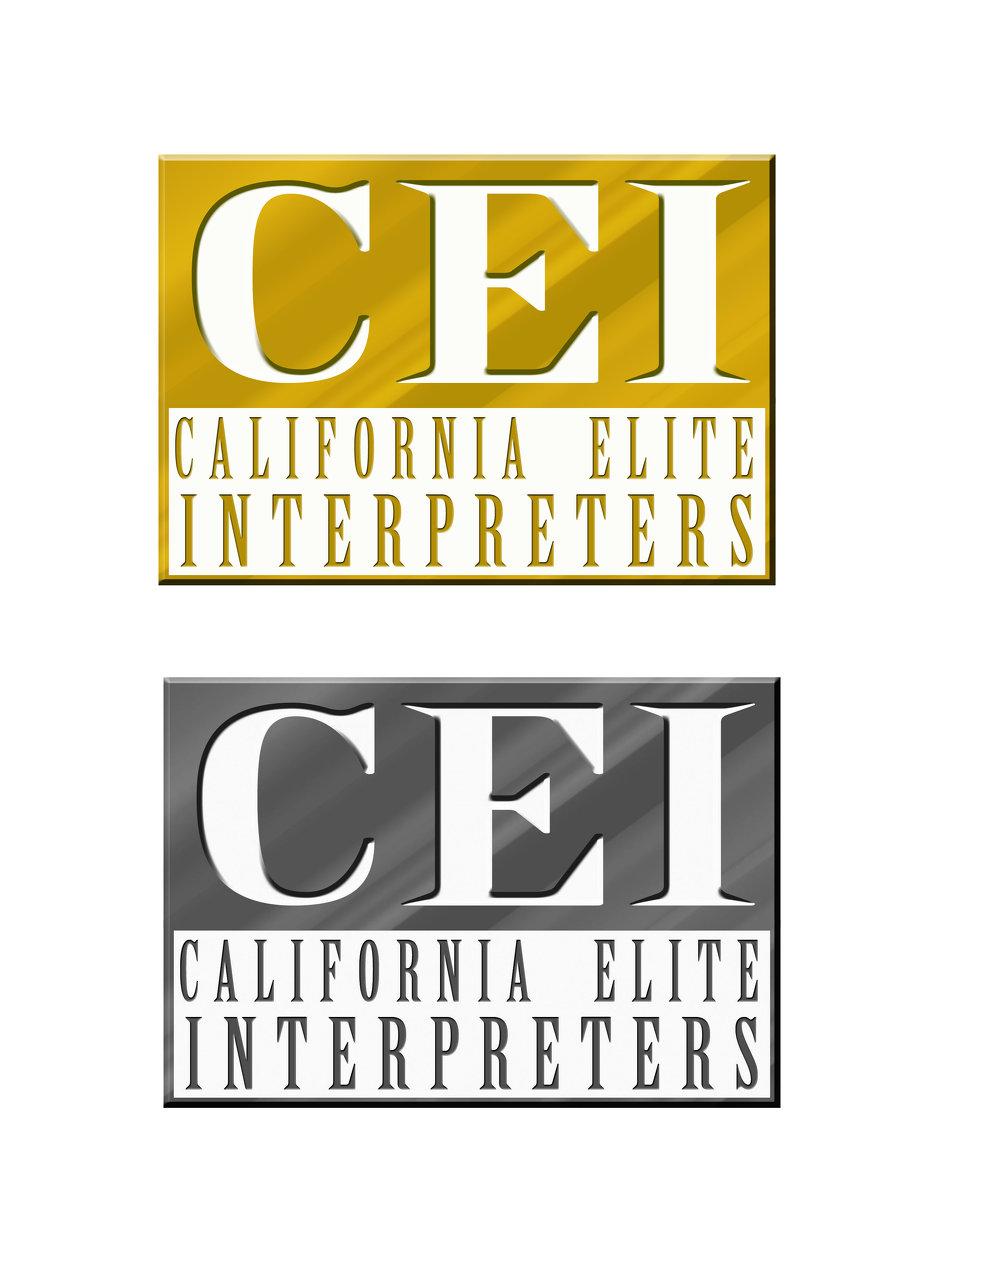 CEI - logo 1 preview.jpg